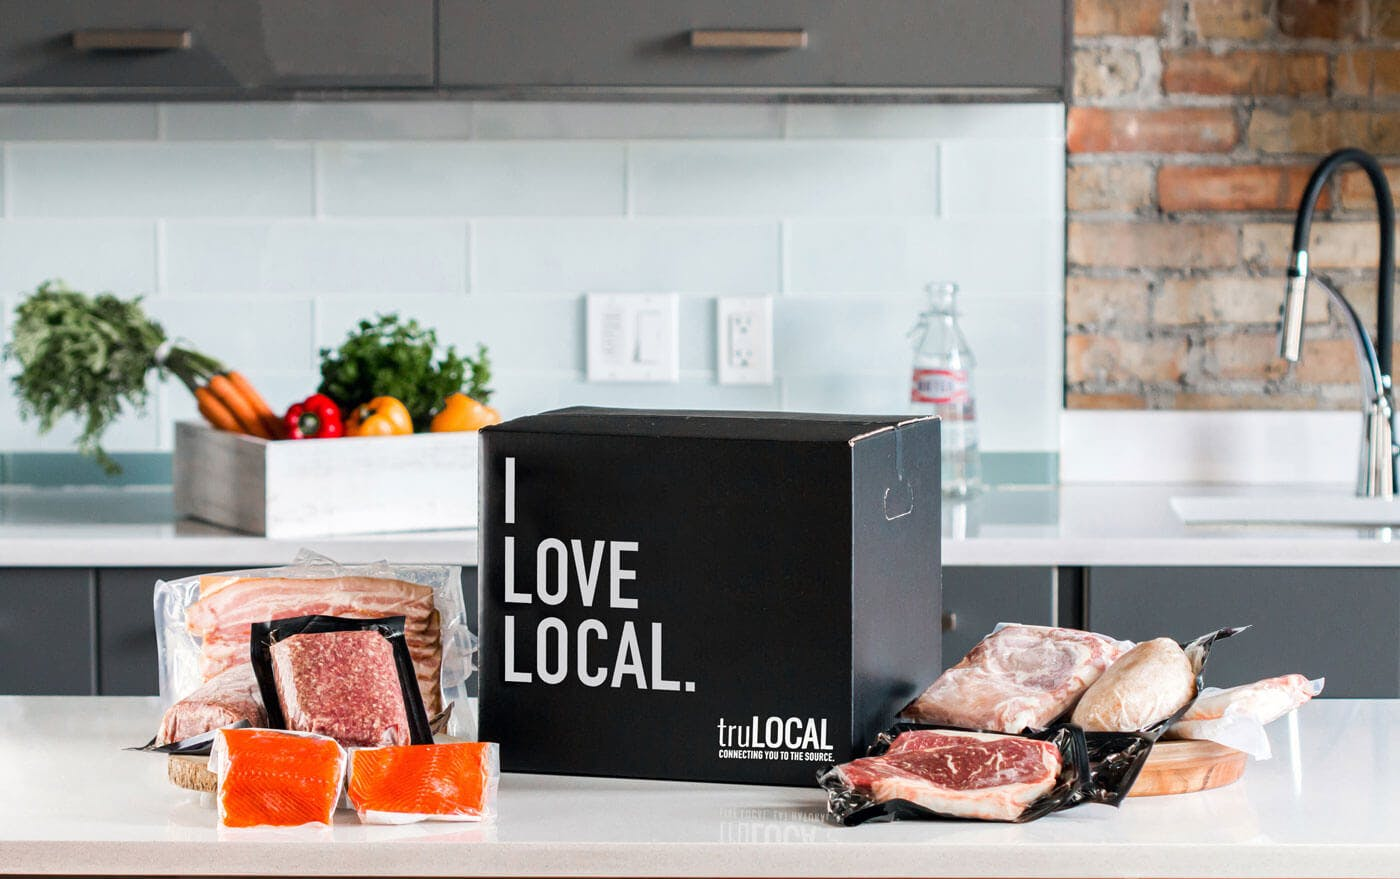 truLOCAL box on kitchen counter